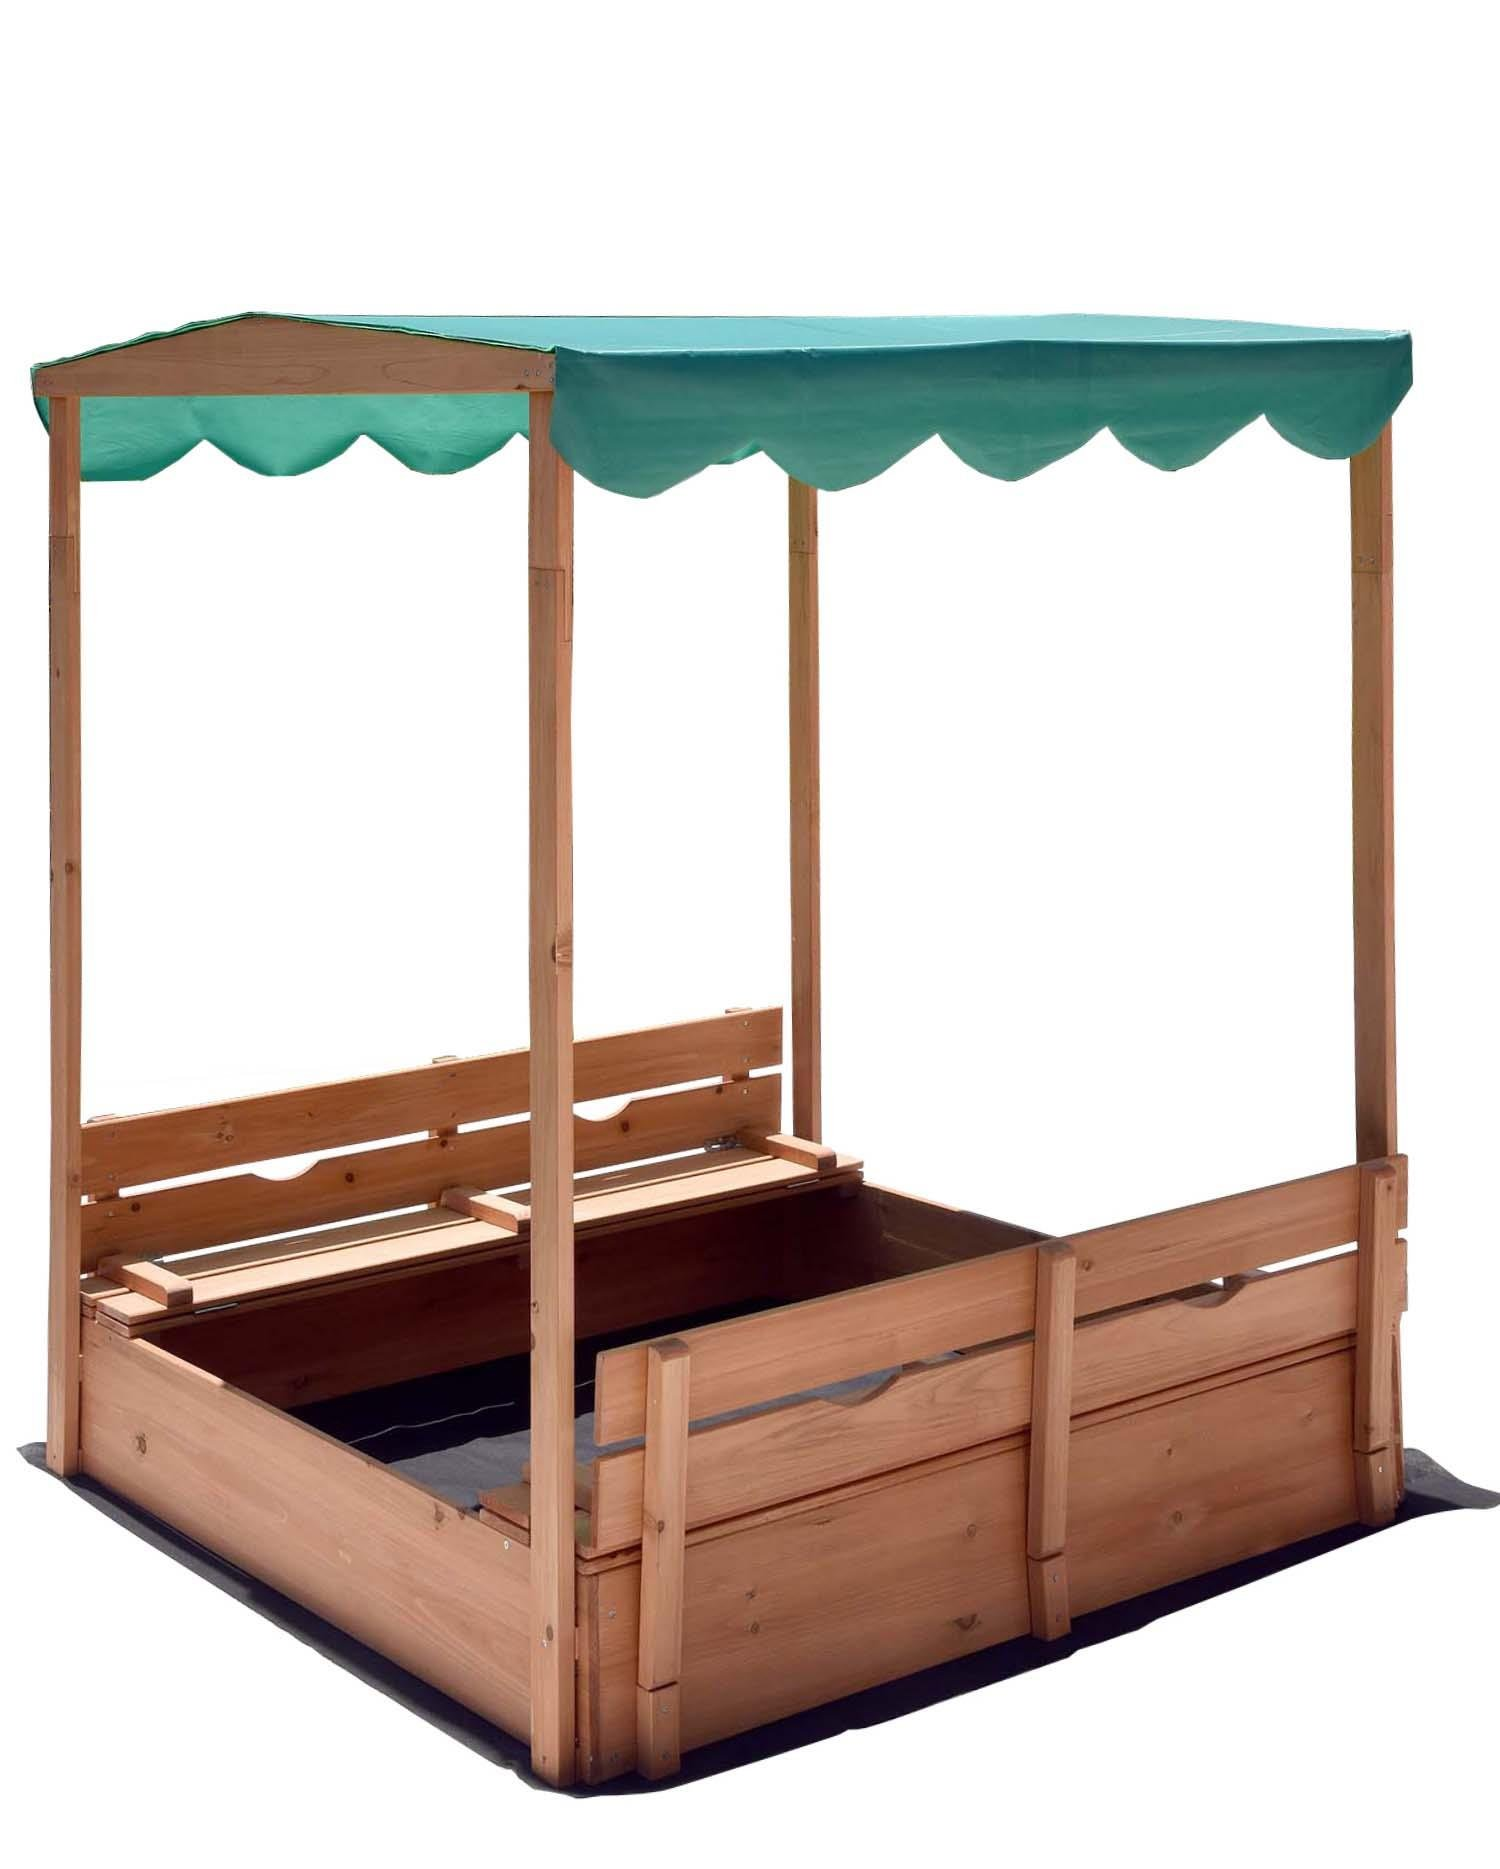 Naomi Home Kids Canopy Cedar Sandbox with Benches by Naomi Home (Image #1)